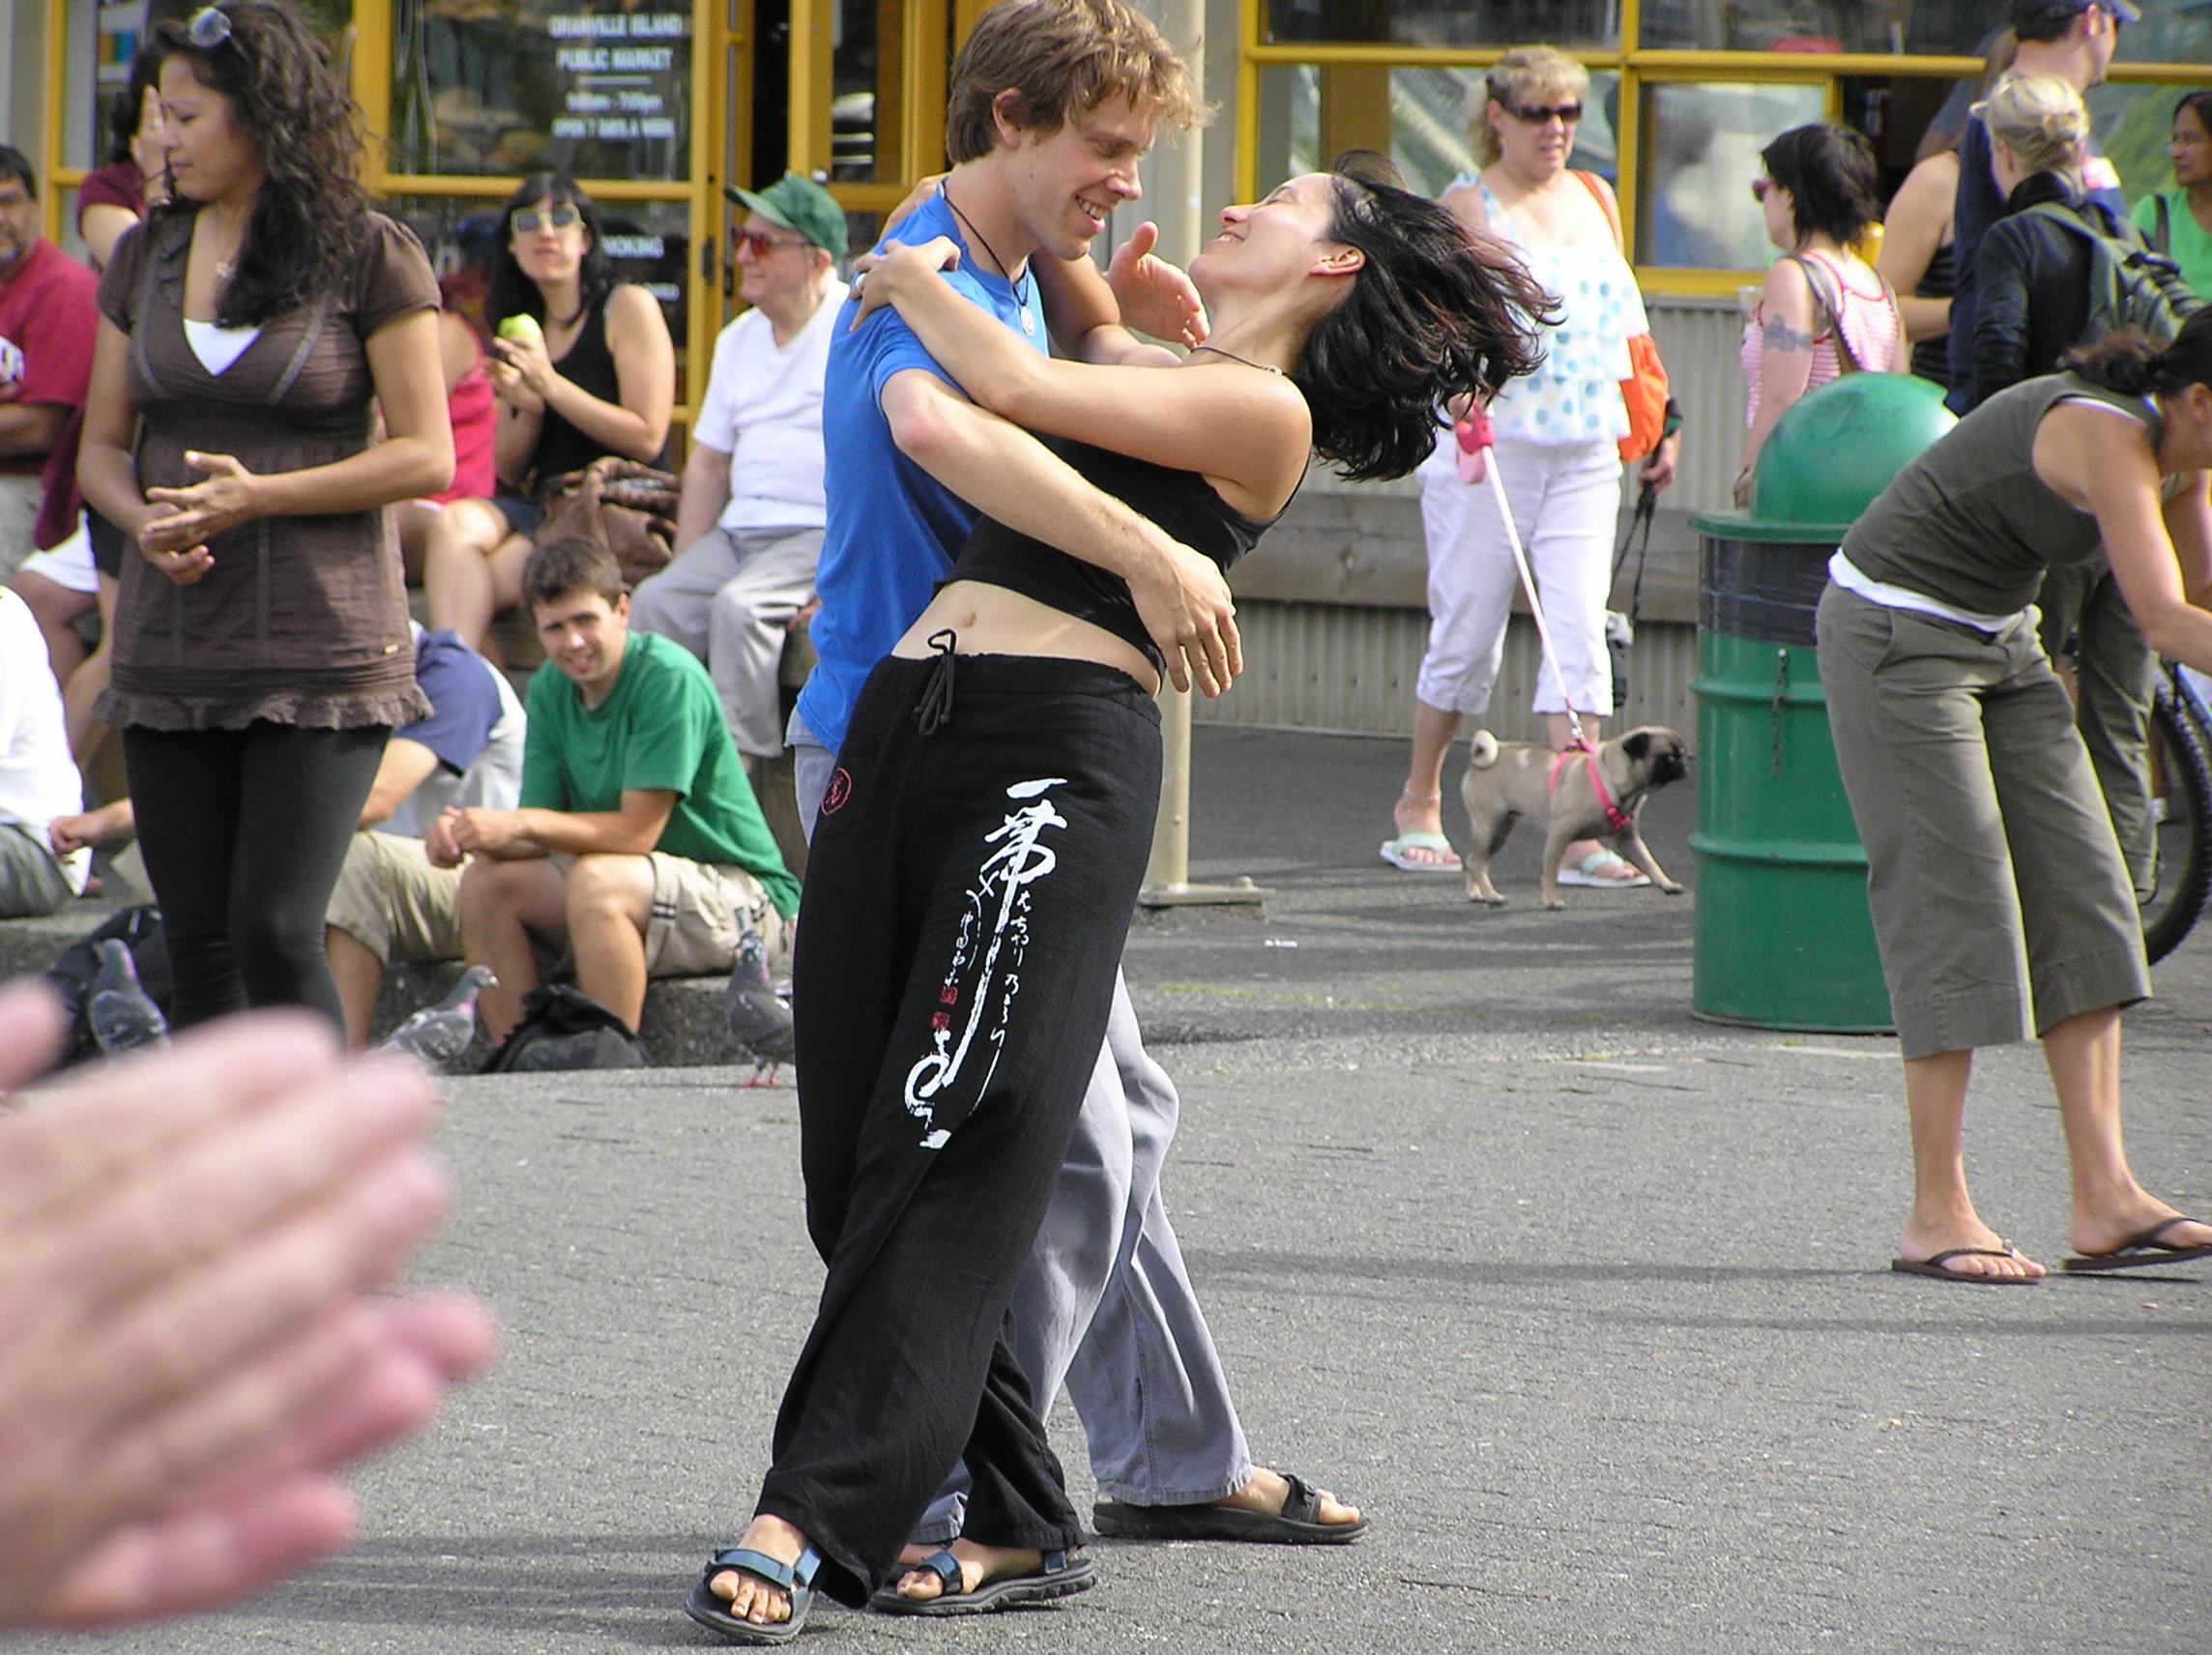 3-gran-isle-dancers.JPG